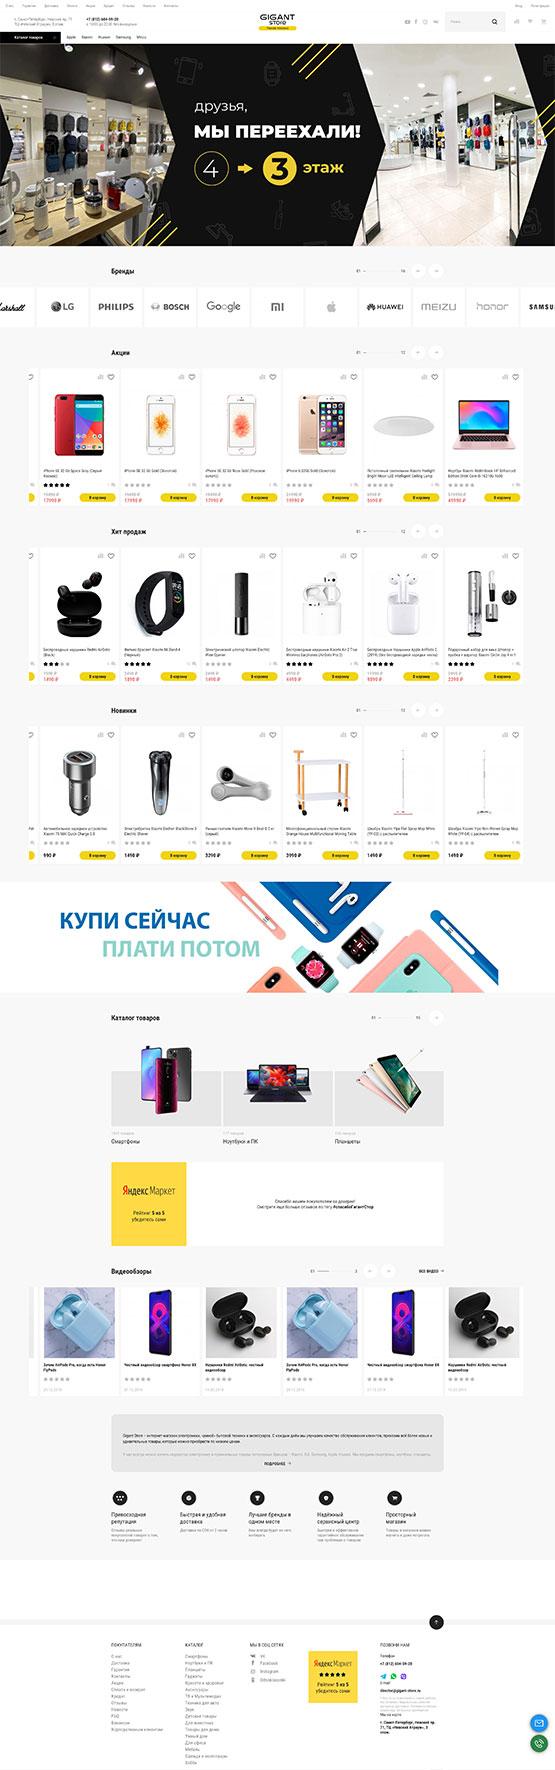 Разработка магазина Gigant-Store.ru Санкт-Петербург